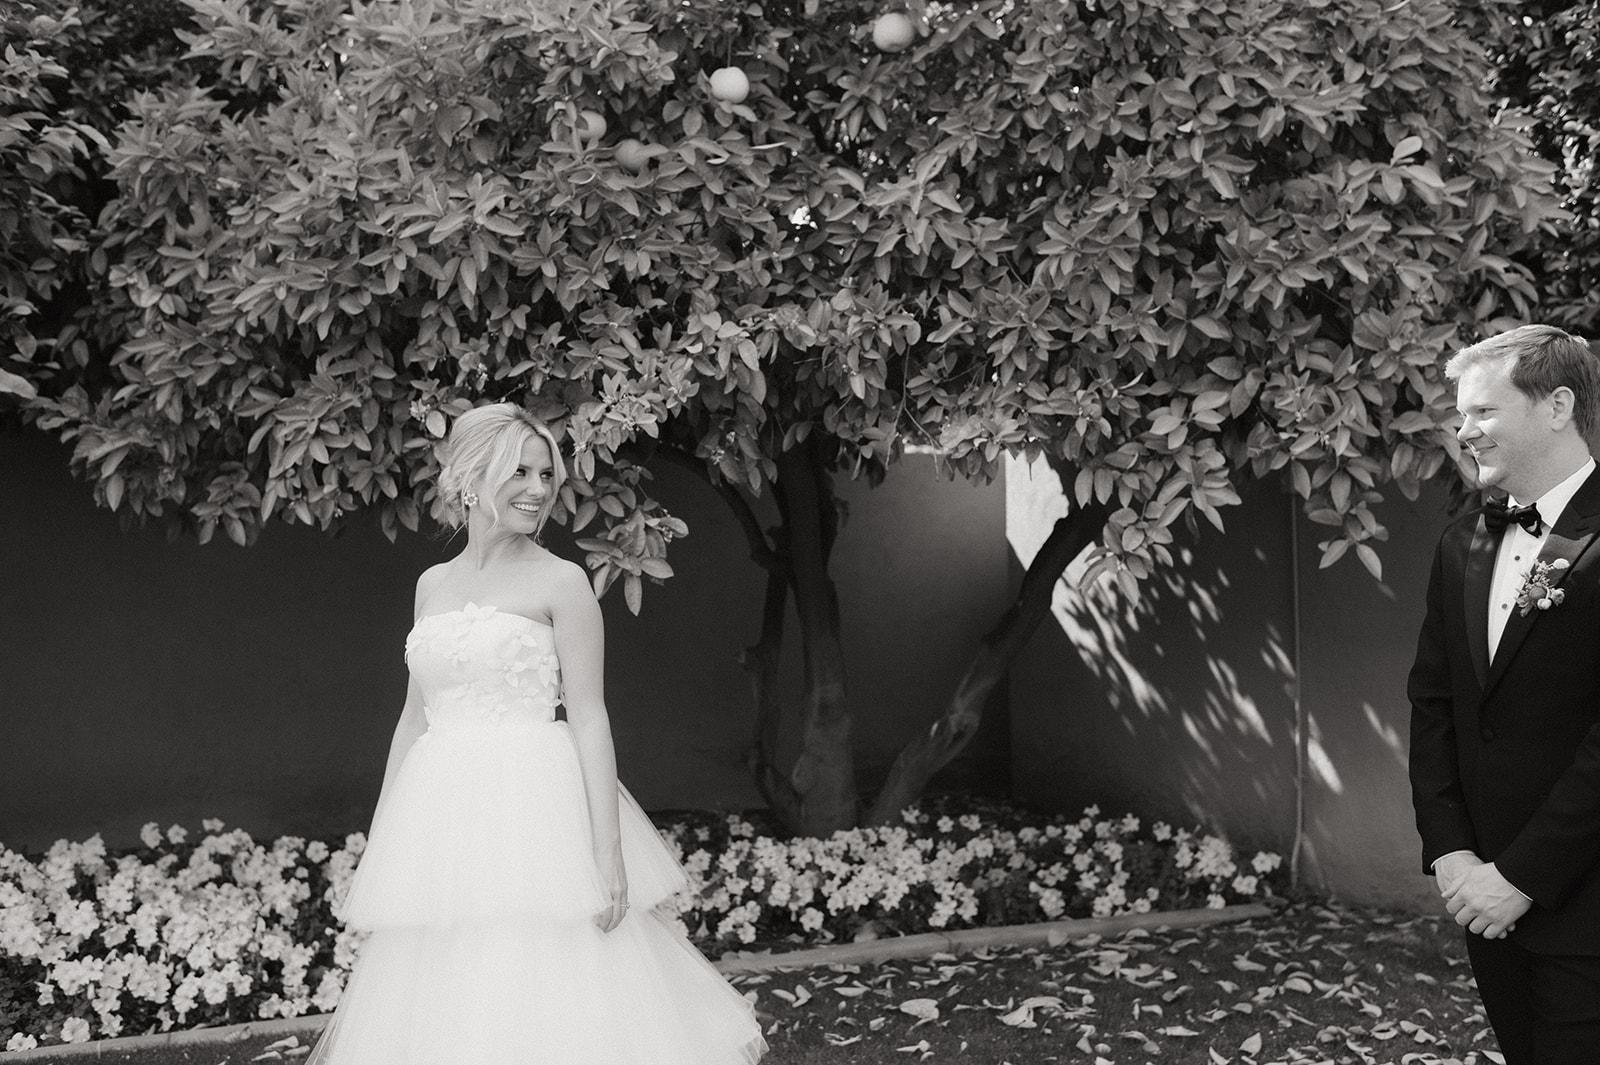 KL_WEDDING_0165.jpg